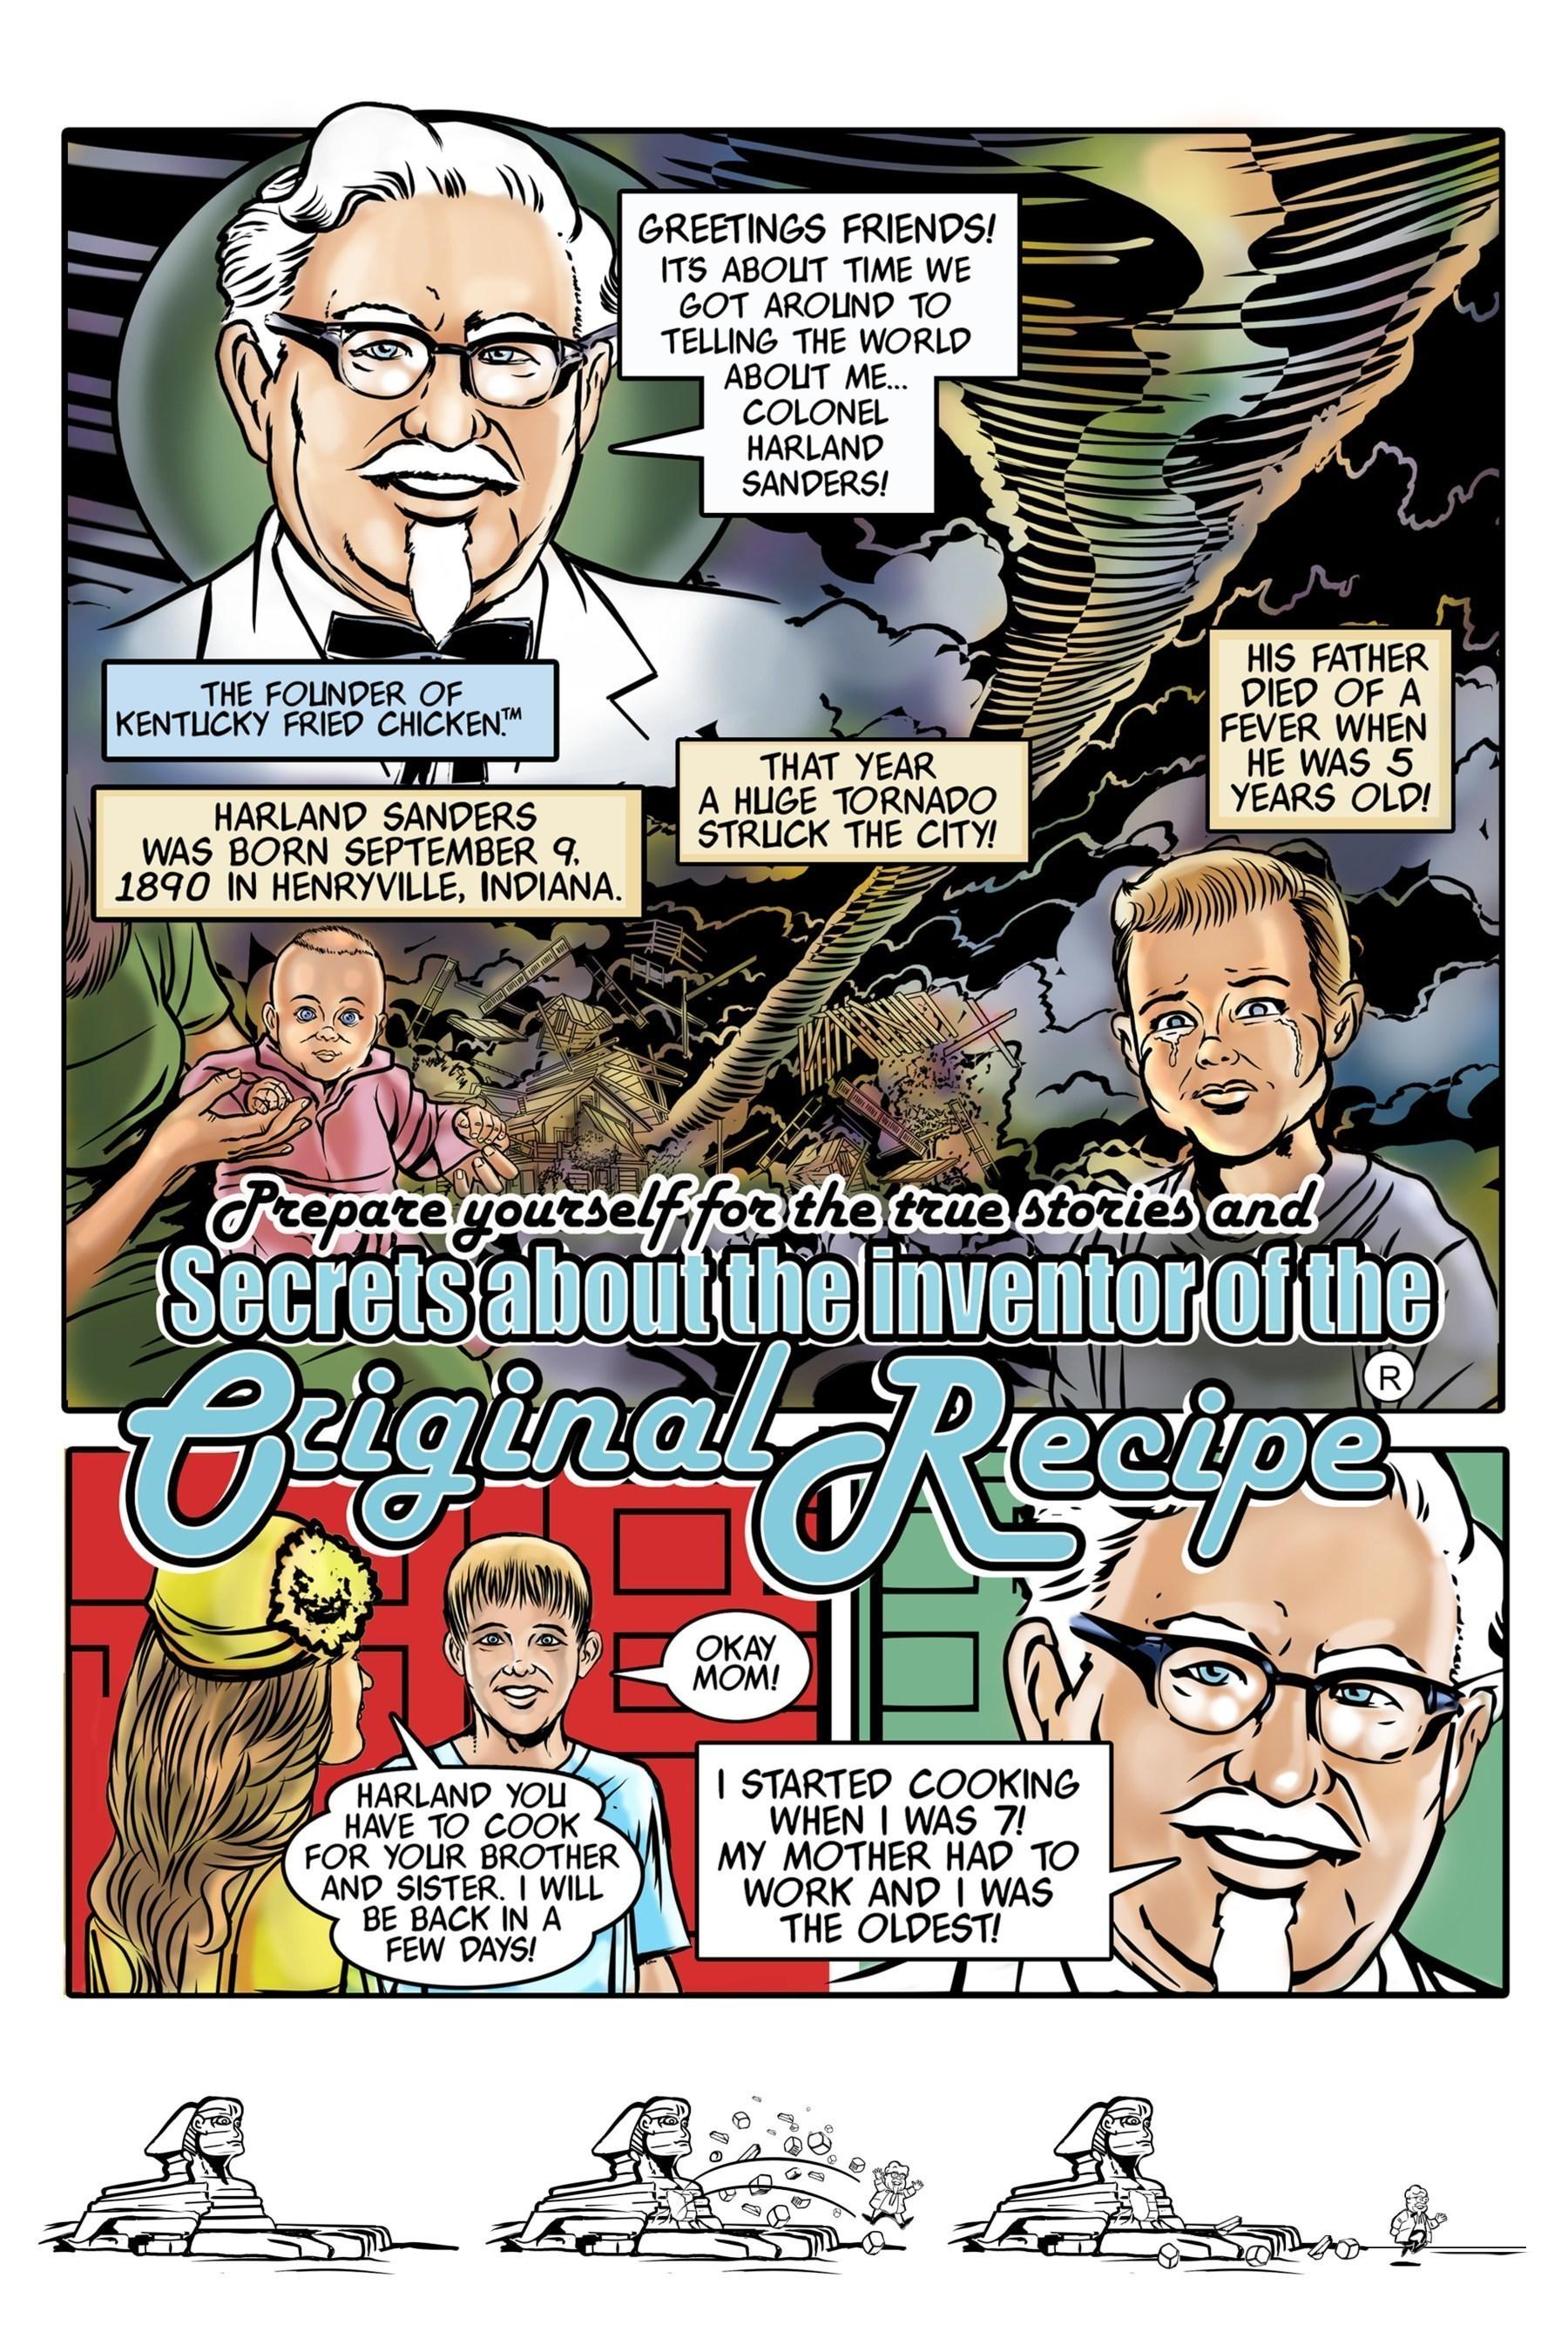 KFC Presents: The Colonel's Adventure Comics